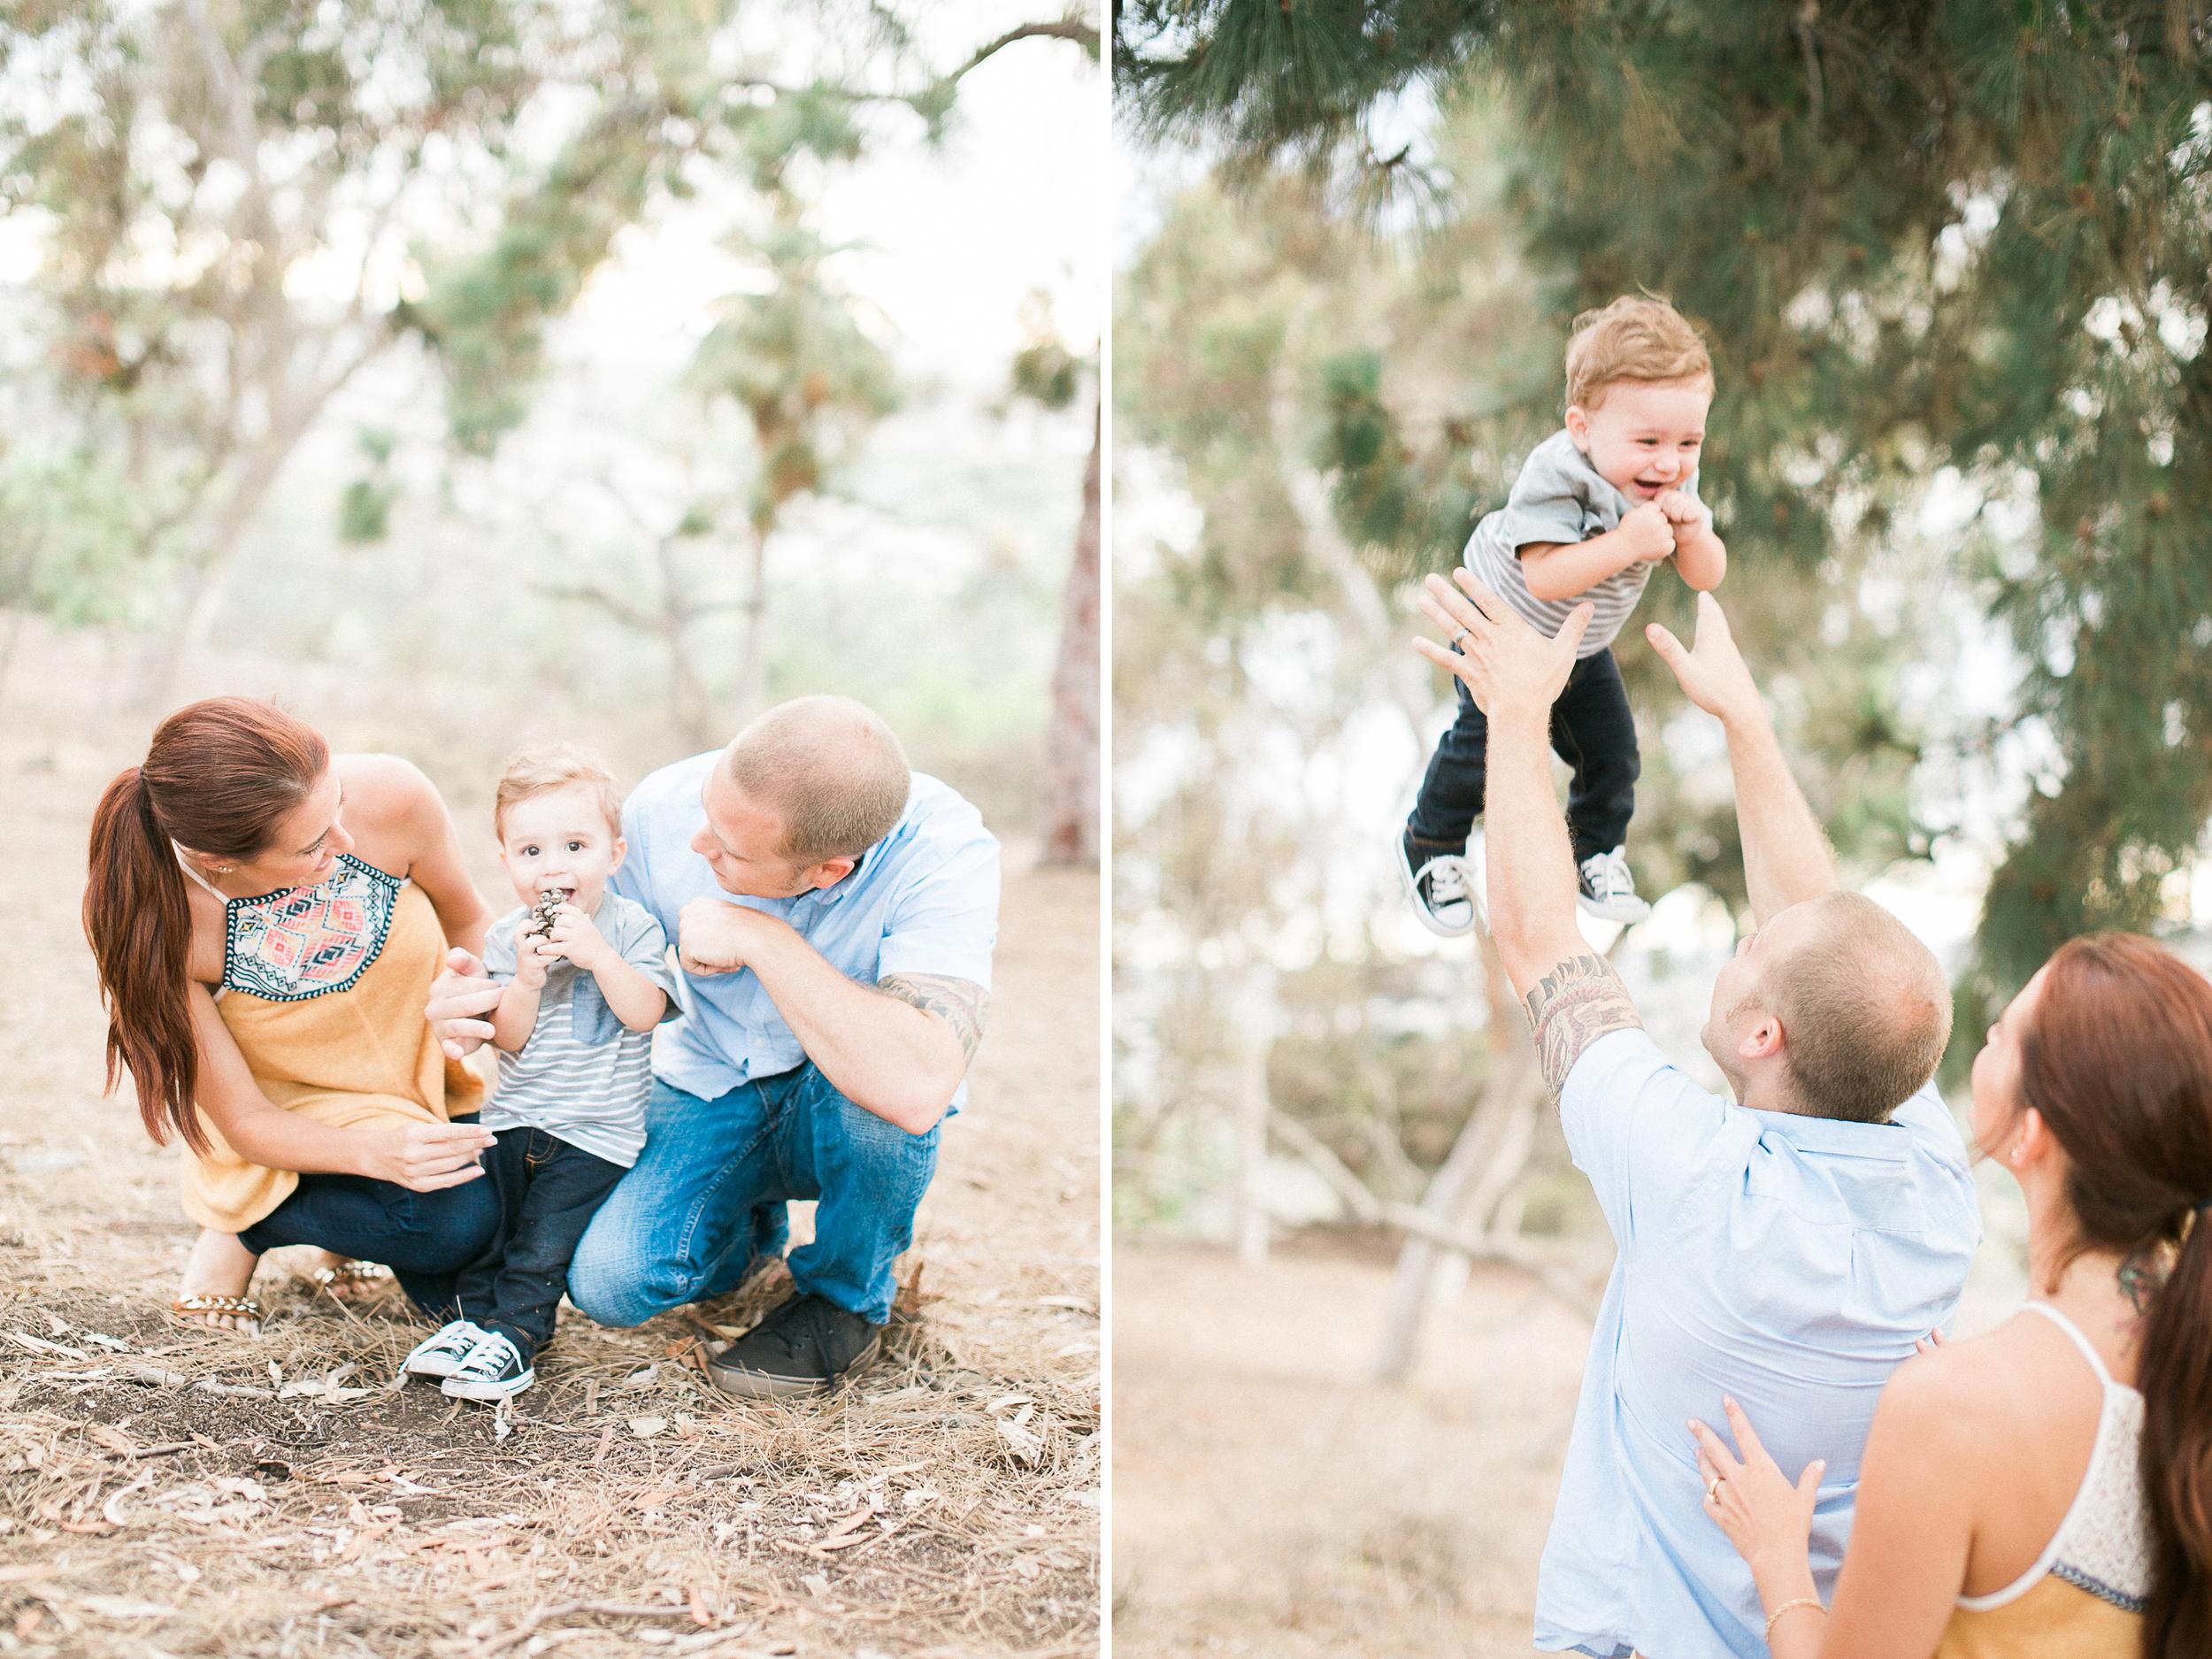 presidio-park-family-photos-5.jpg